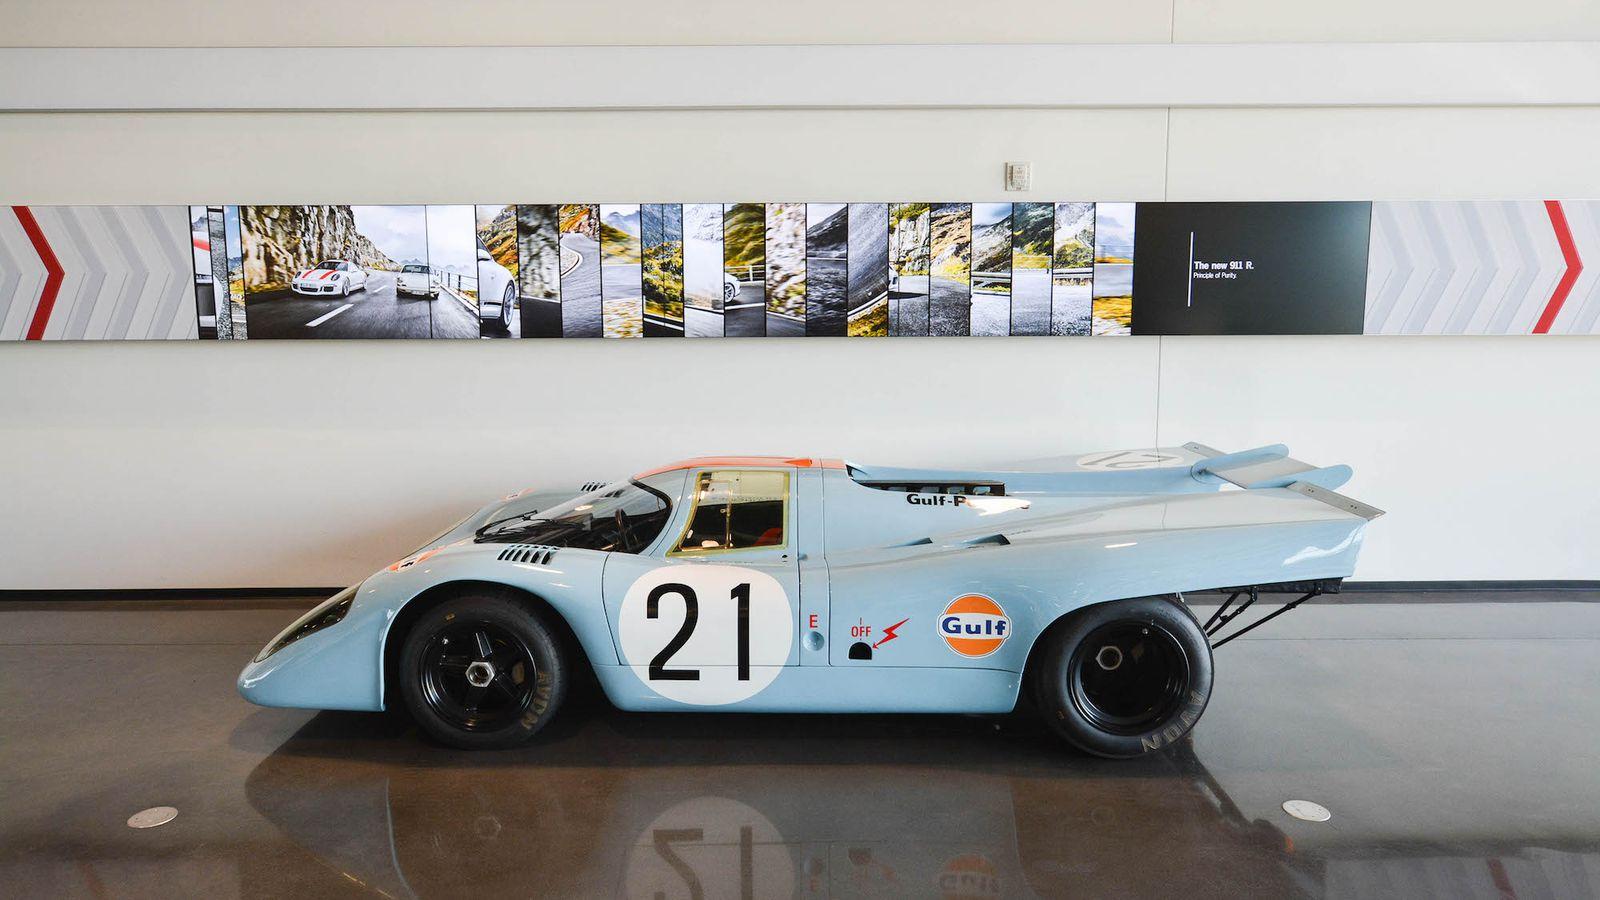 Porsche Driving Experience Carson >> Porsche's Hidden Restaurant Is LA's Best New Secret - Eater LA